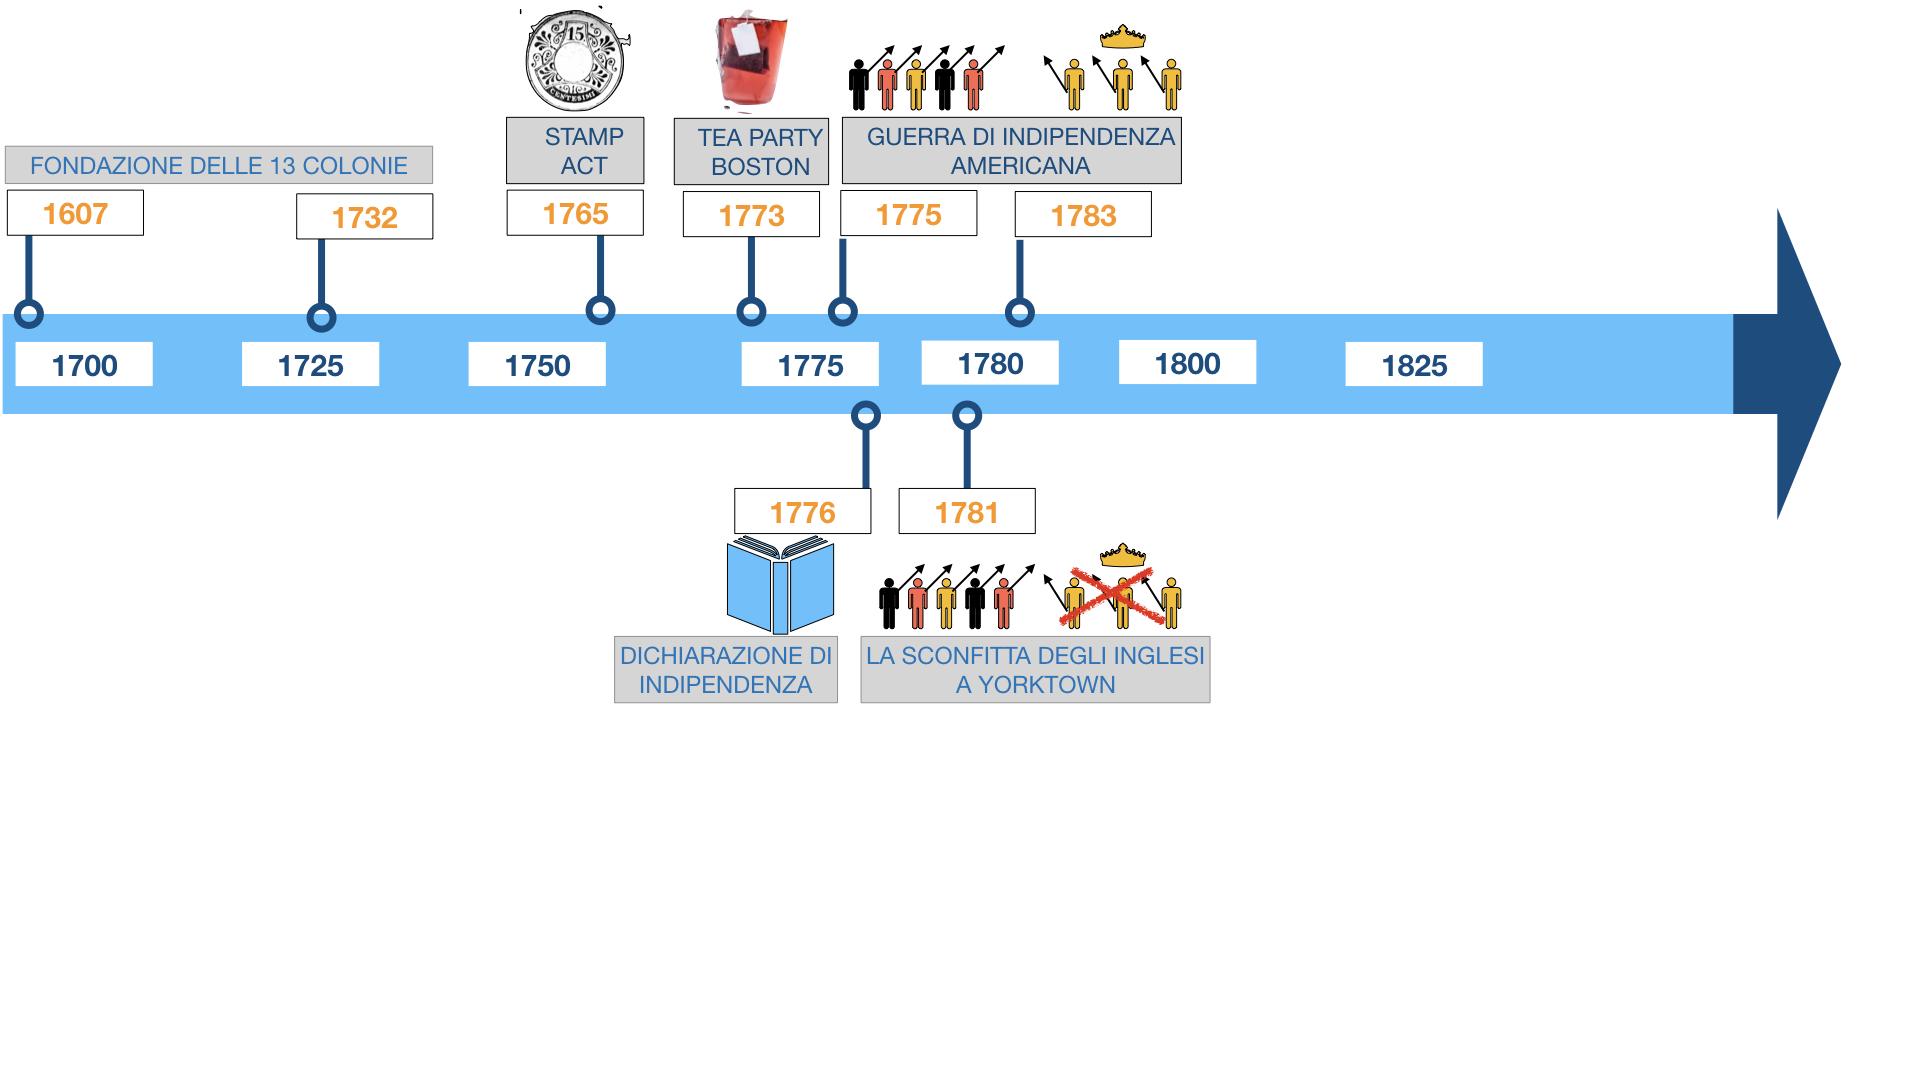 GUERRA DI INDIPENDENZA AMERICANA_SIMULAZIONE.154